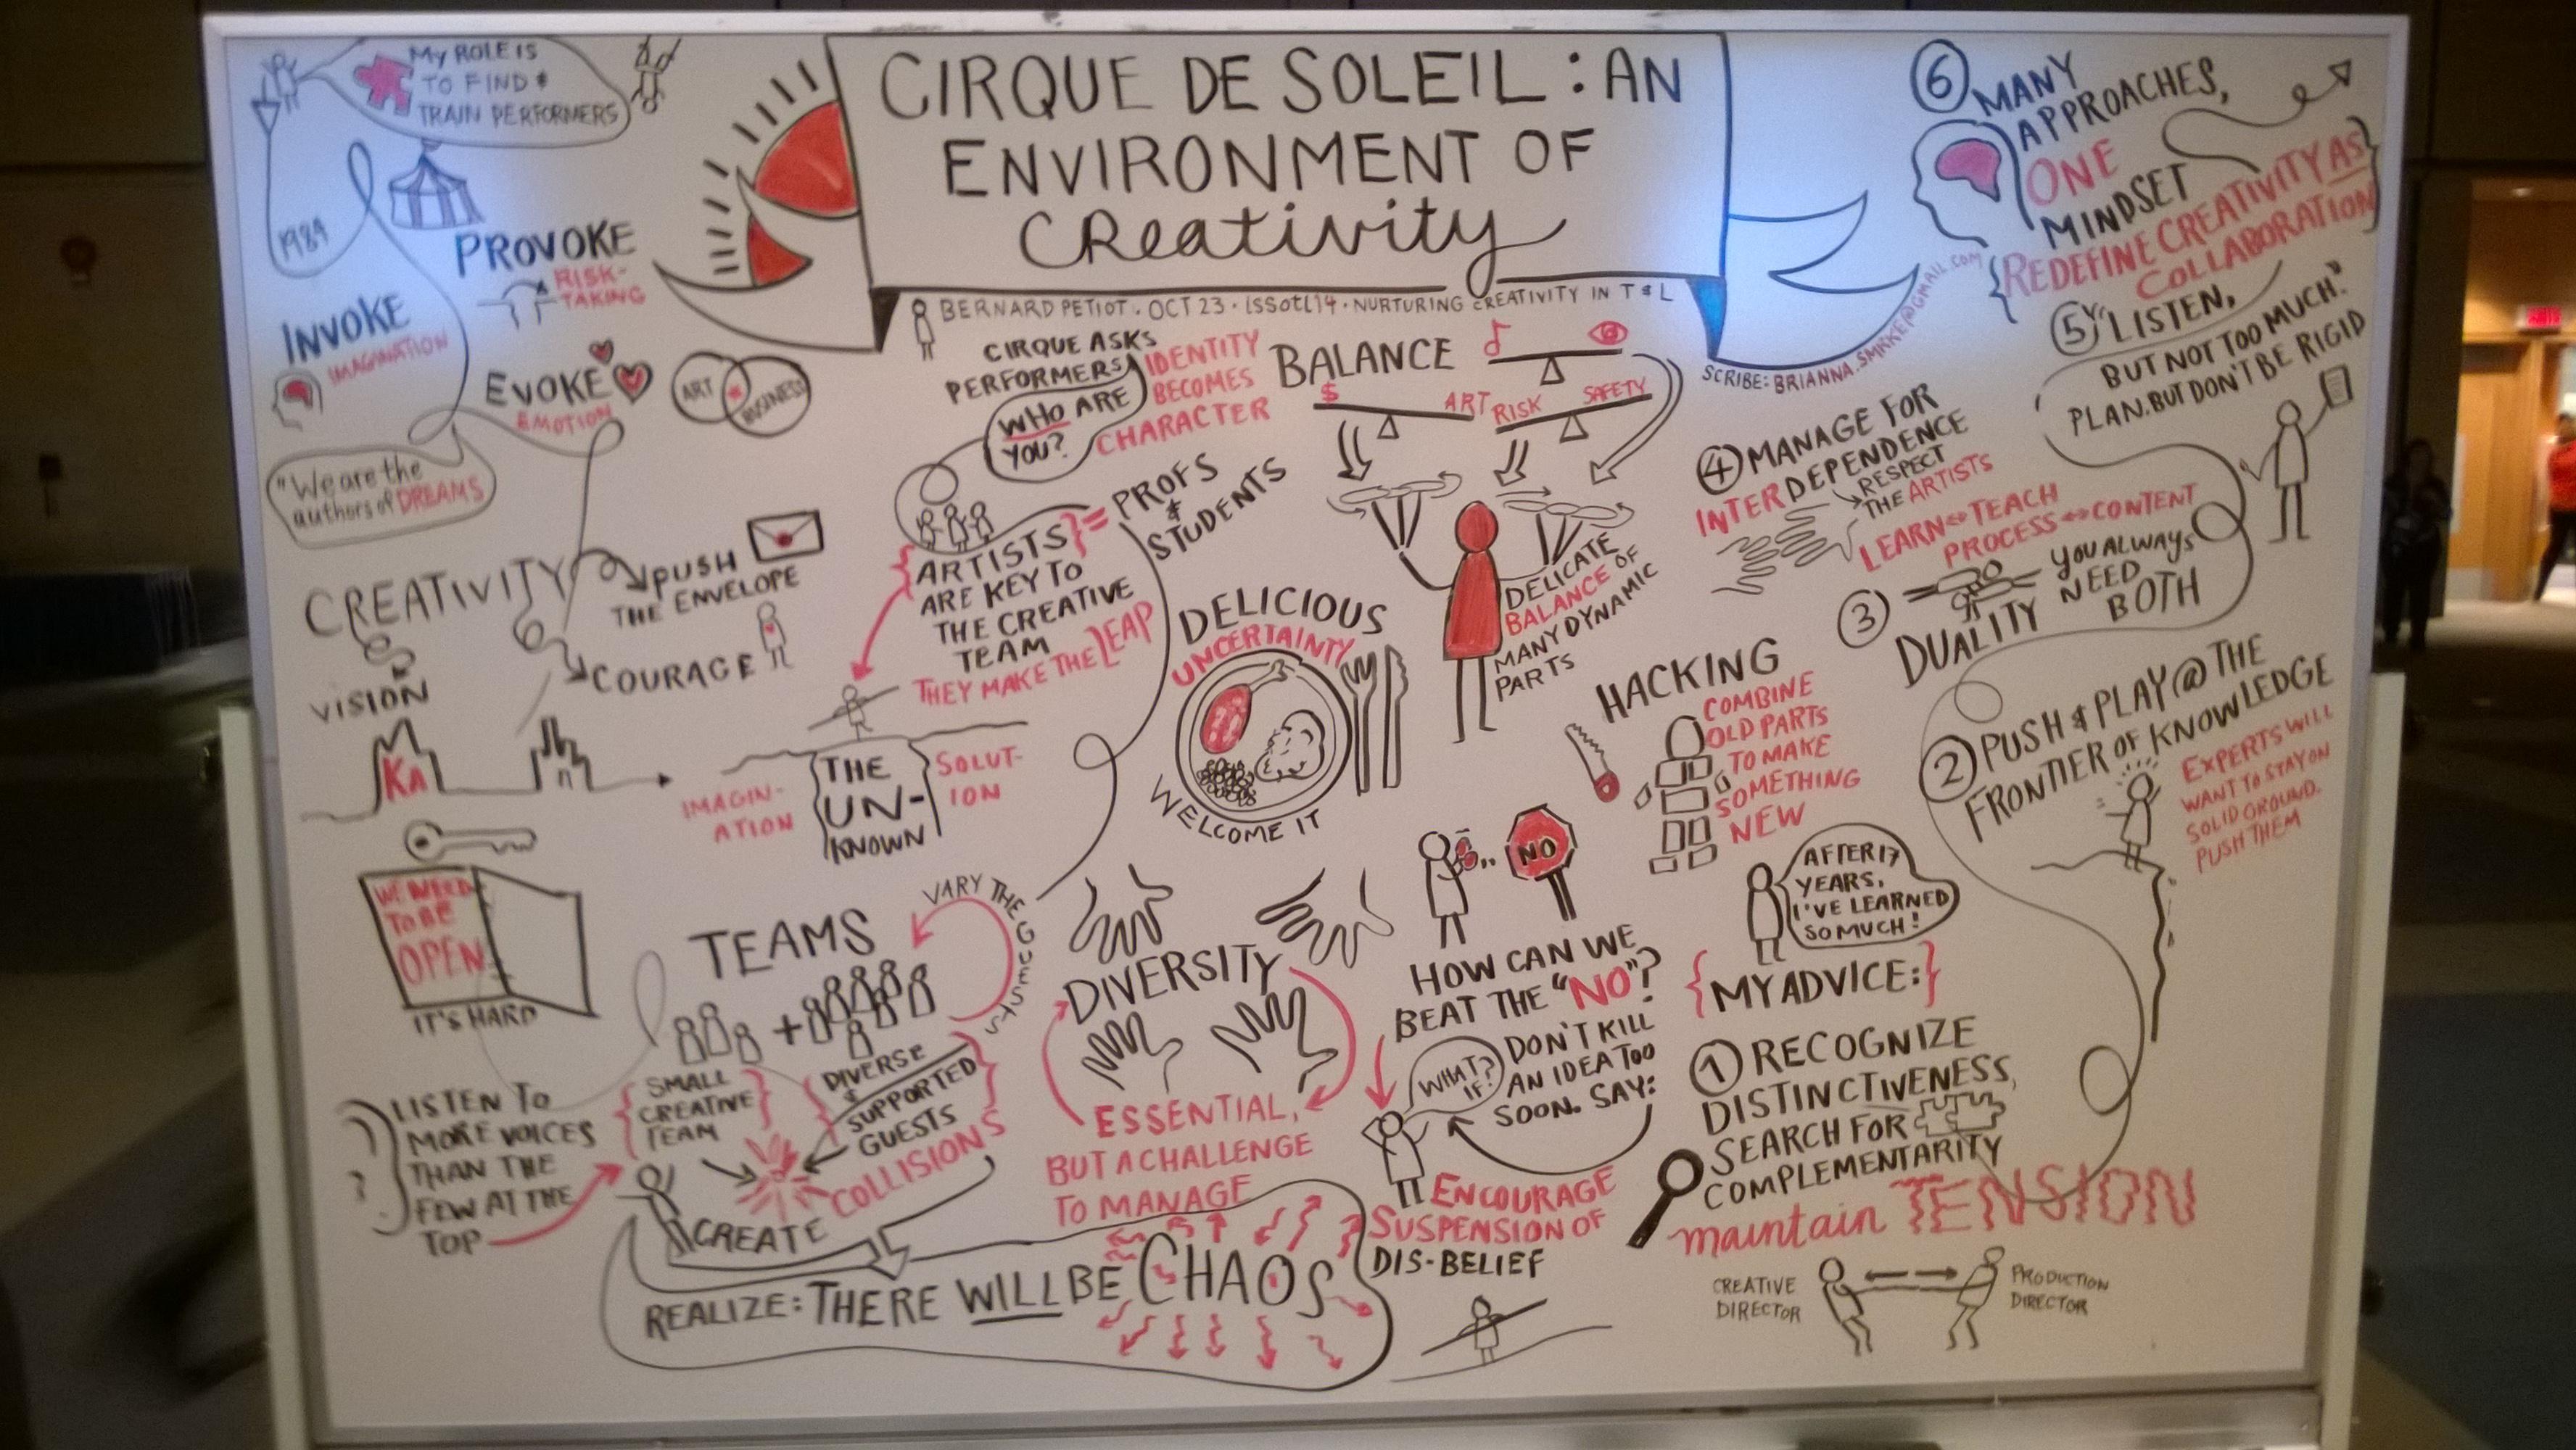 whiteboard from Cirque du Soleil presentation at ISSOTL 2014